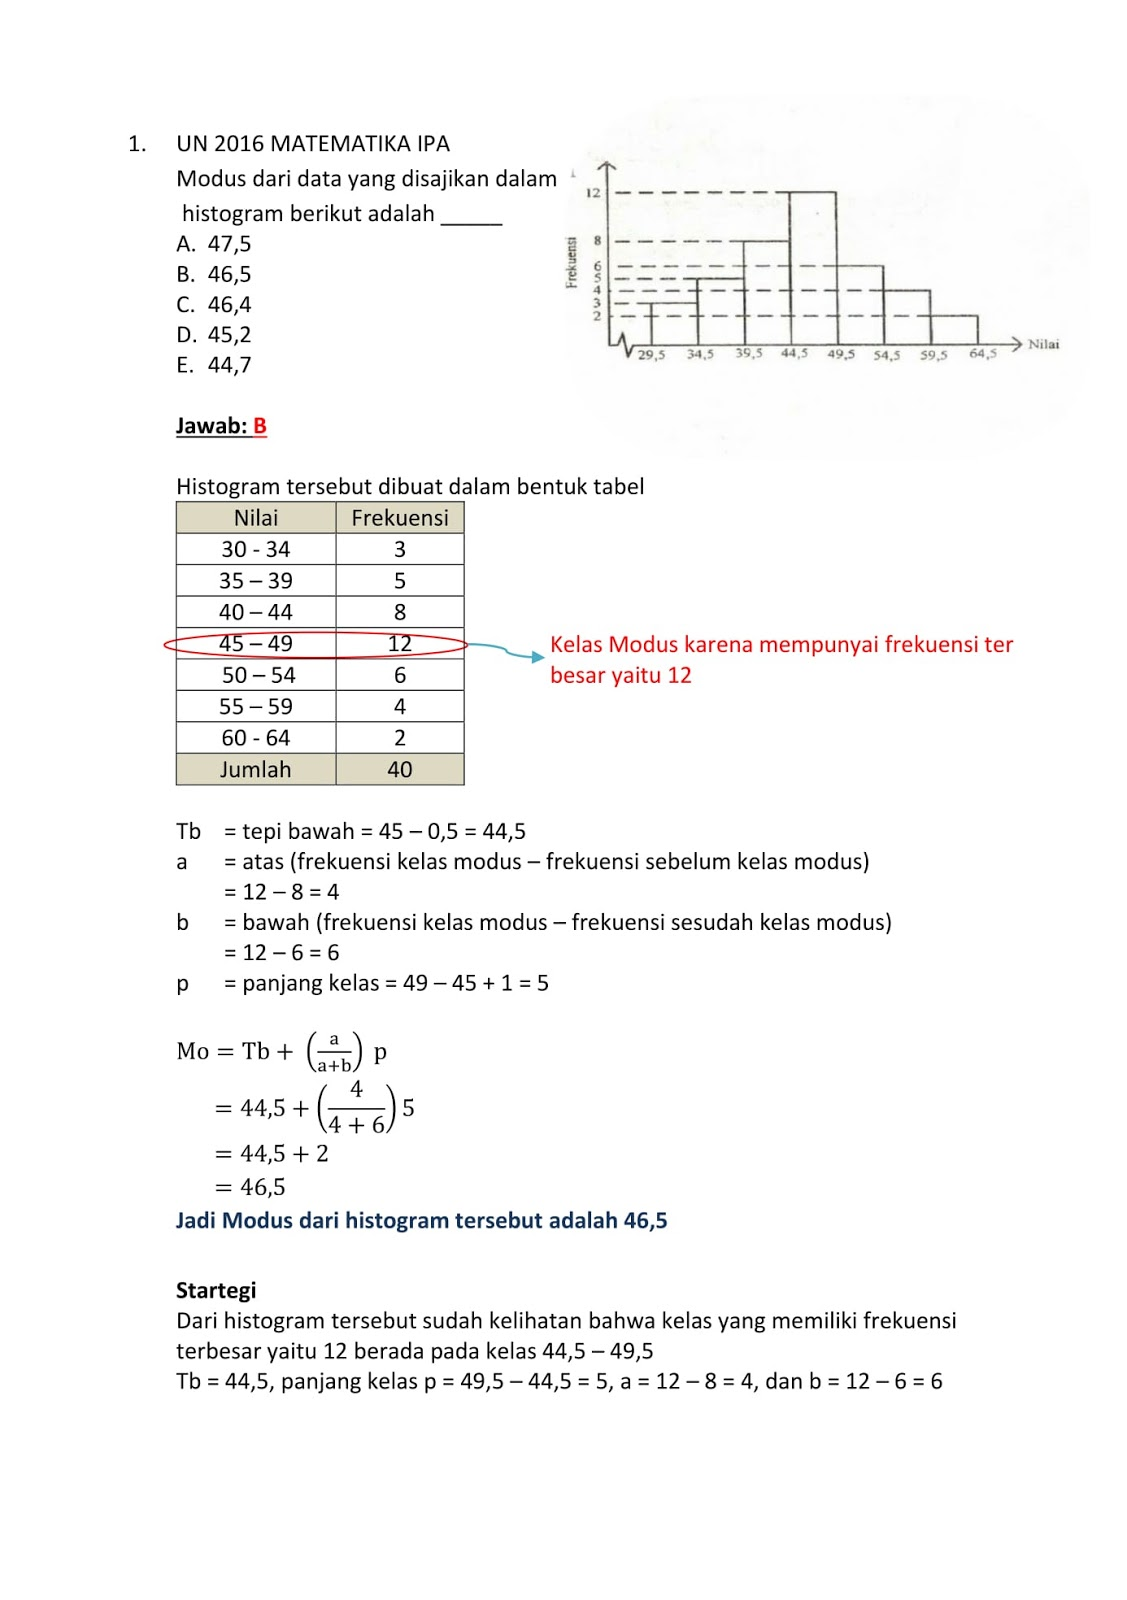 Contoh Soal Dan Pembahasan Statistika Kelas 12 : contoh, pembahasan, statistika, kelas, Contoh, Sbmptn, Matematika, Statistika, Kumpulan, Pelajaran